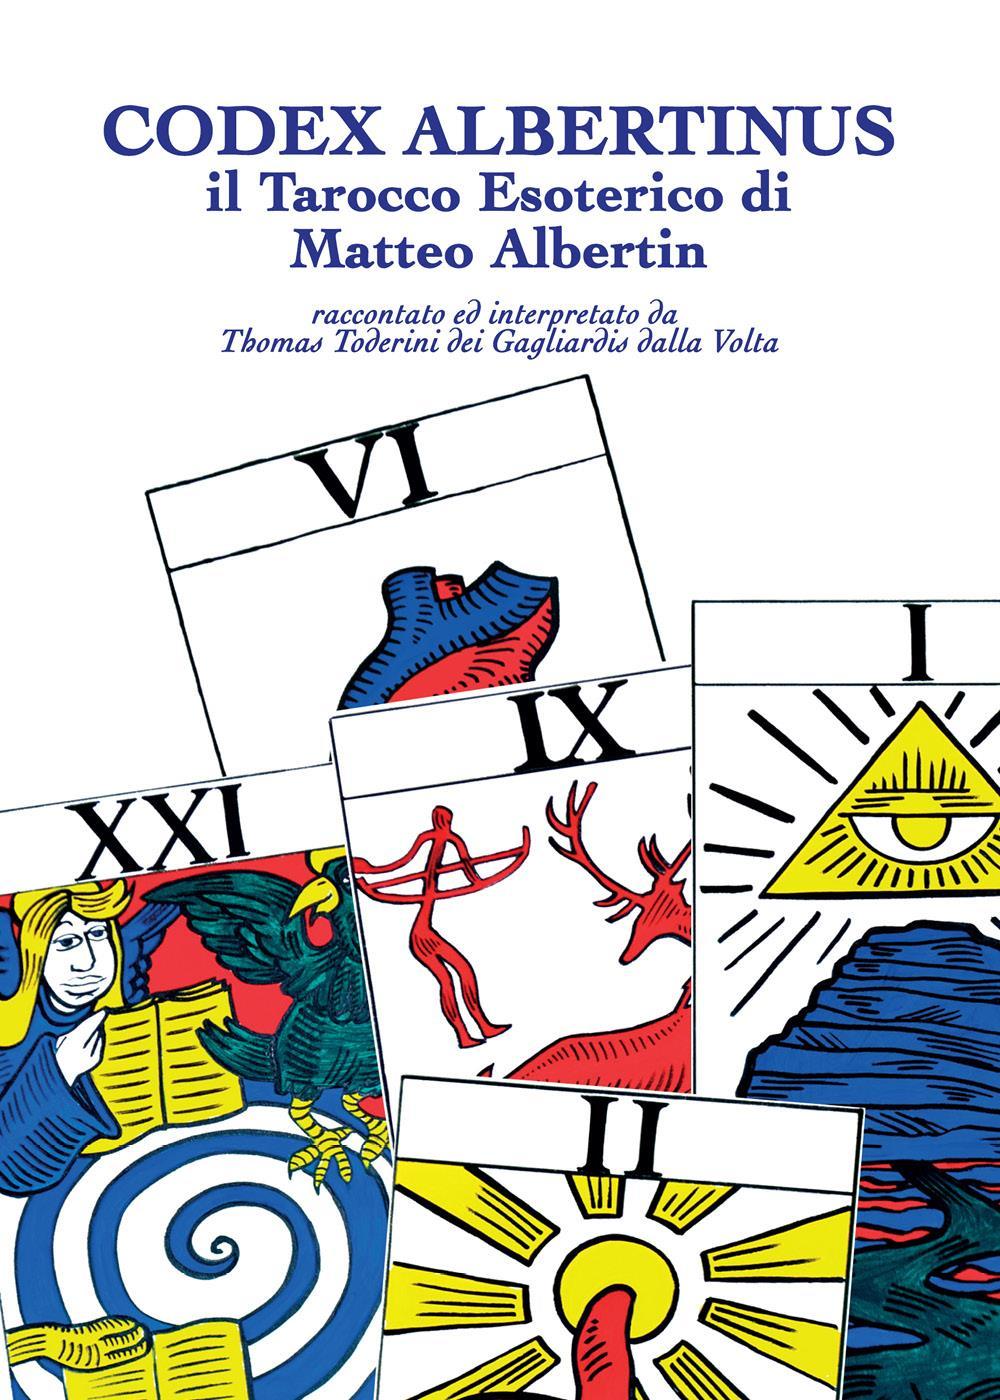 Codex Albertinus